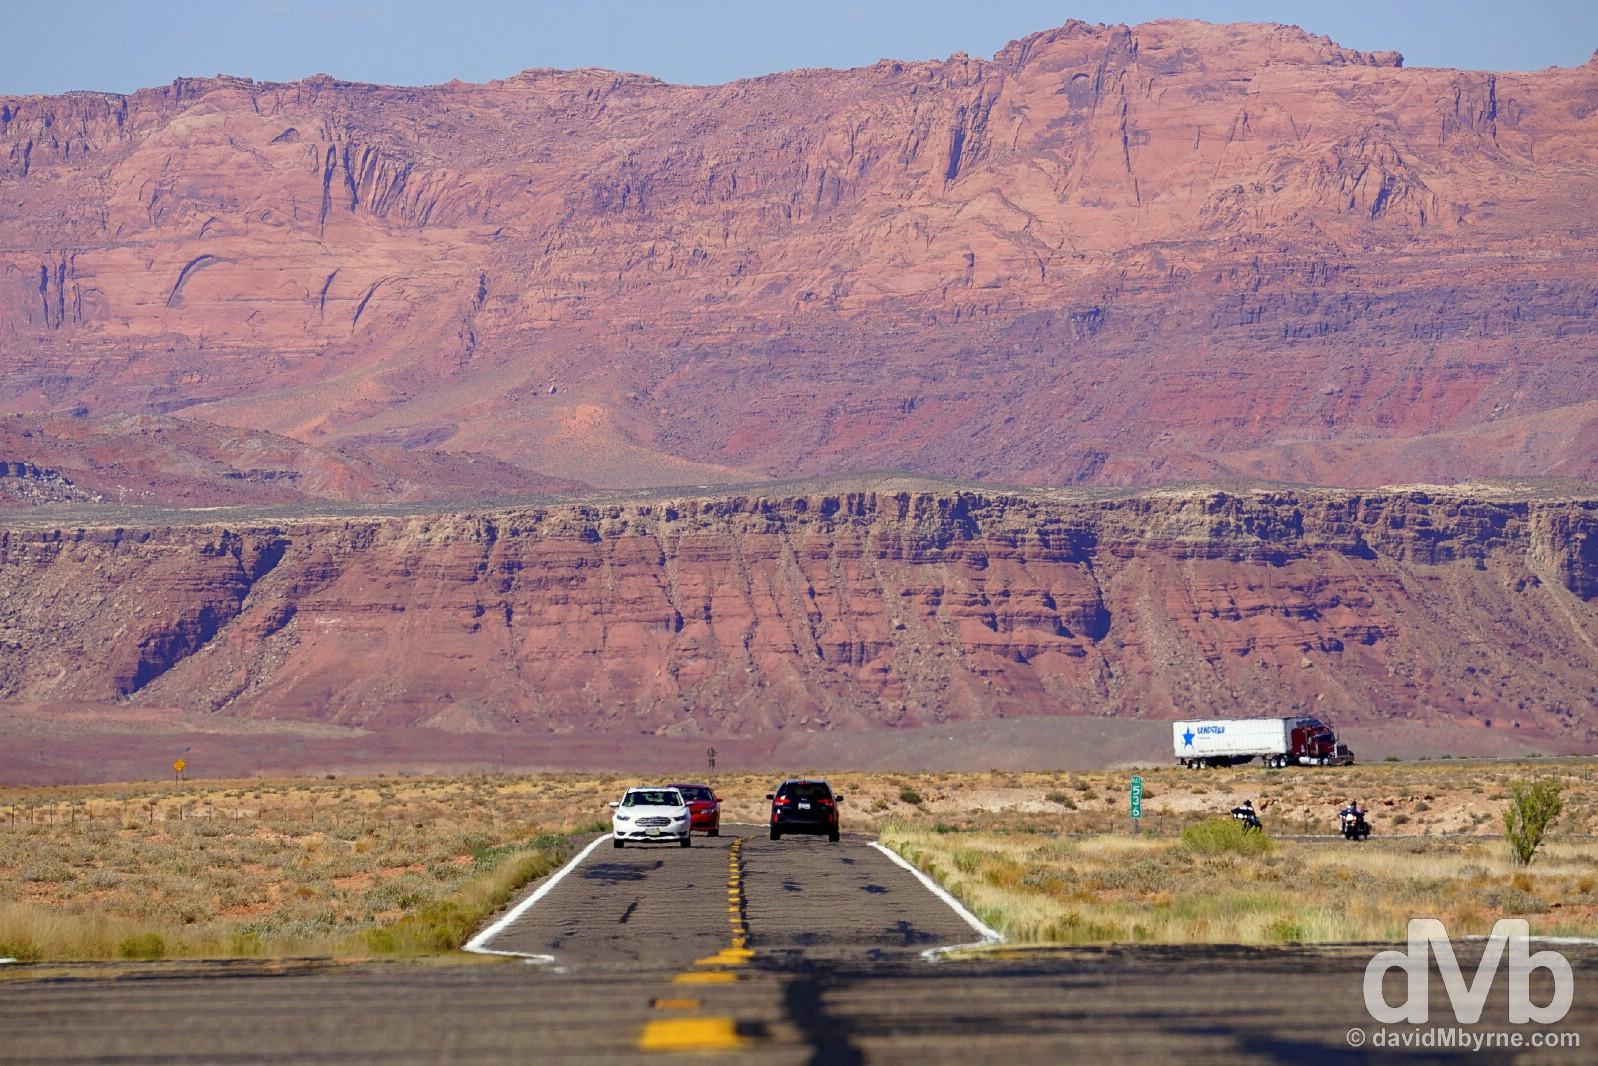 The Vermilion Cliffs as seen from ALT 89, Arizona, USA. September 9, 2016.